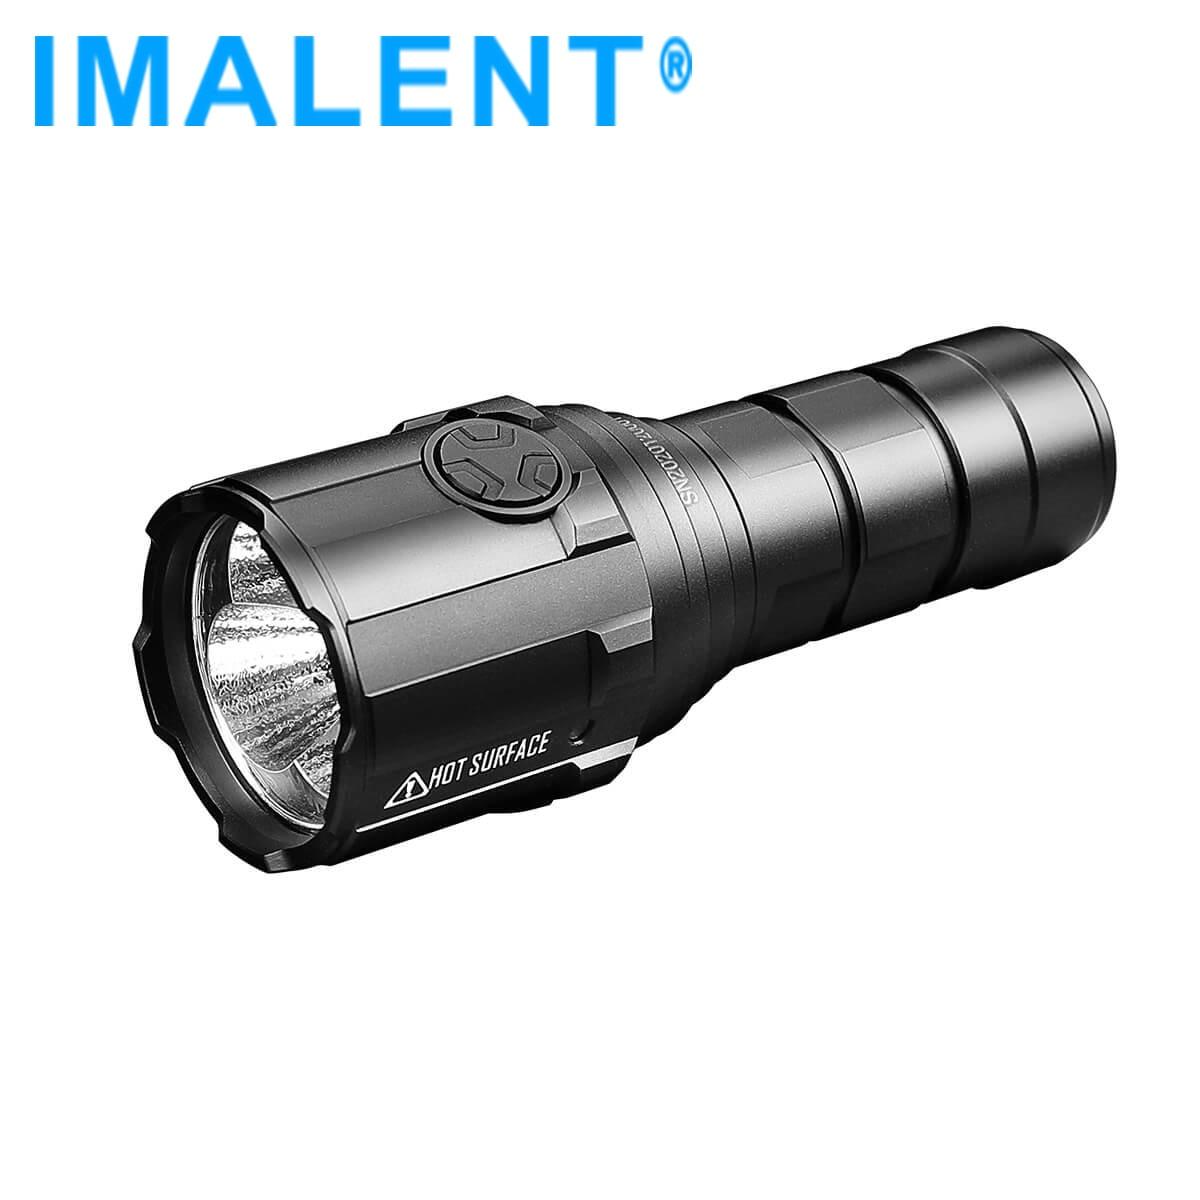 imalent r30c power led lanterna 9000 lumens 01